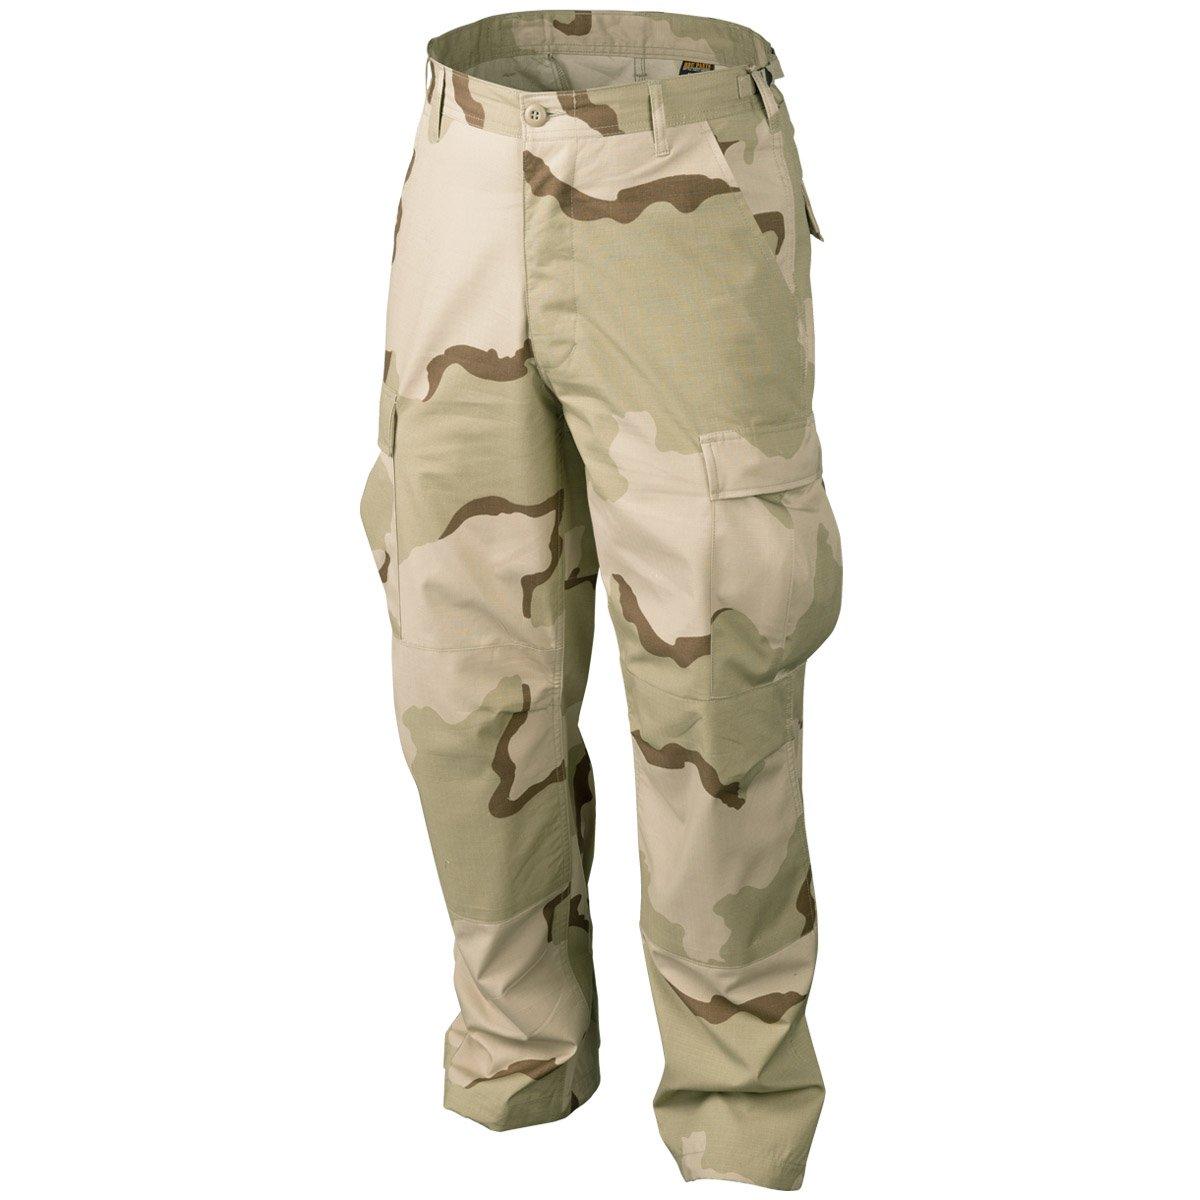 Helikon genuino pantalones BDU pantalones genuino Cotton Ripstop 3-Colour Desert Tamaño M Reg 89ebbc